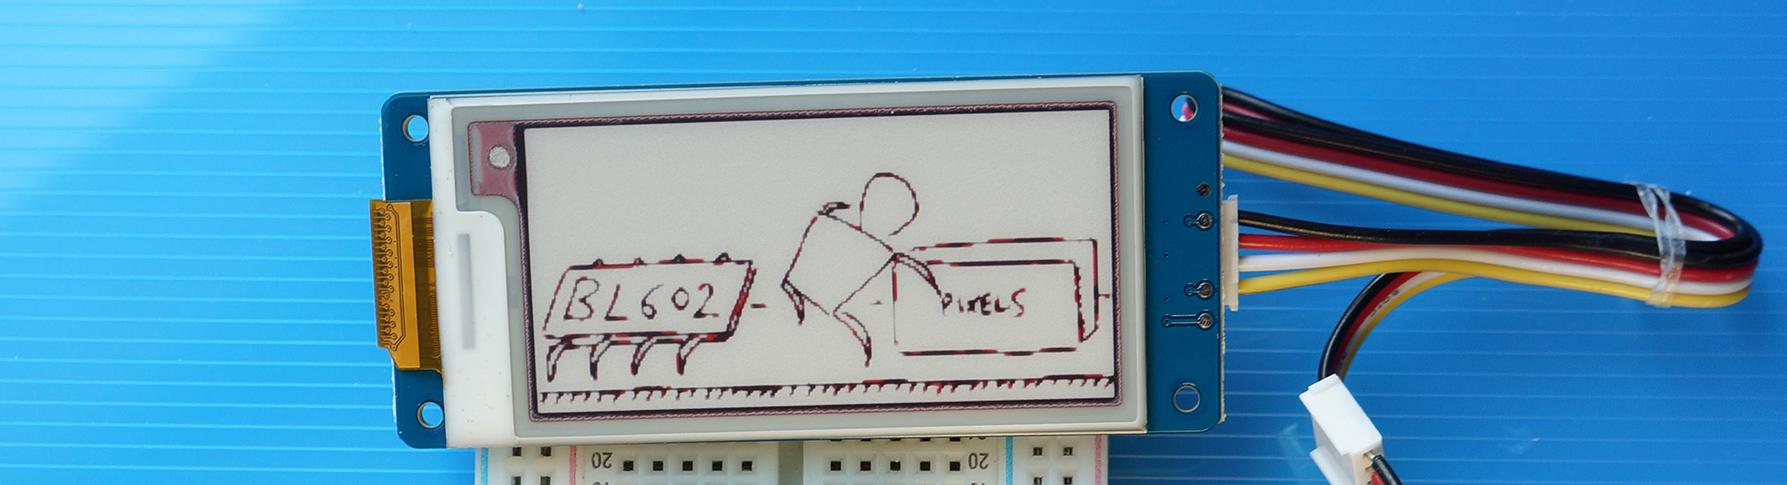 Grove E-Ink Display close up